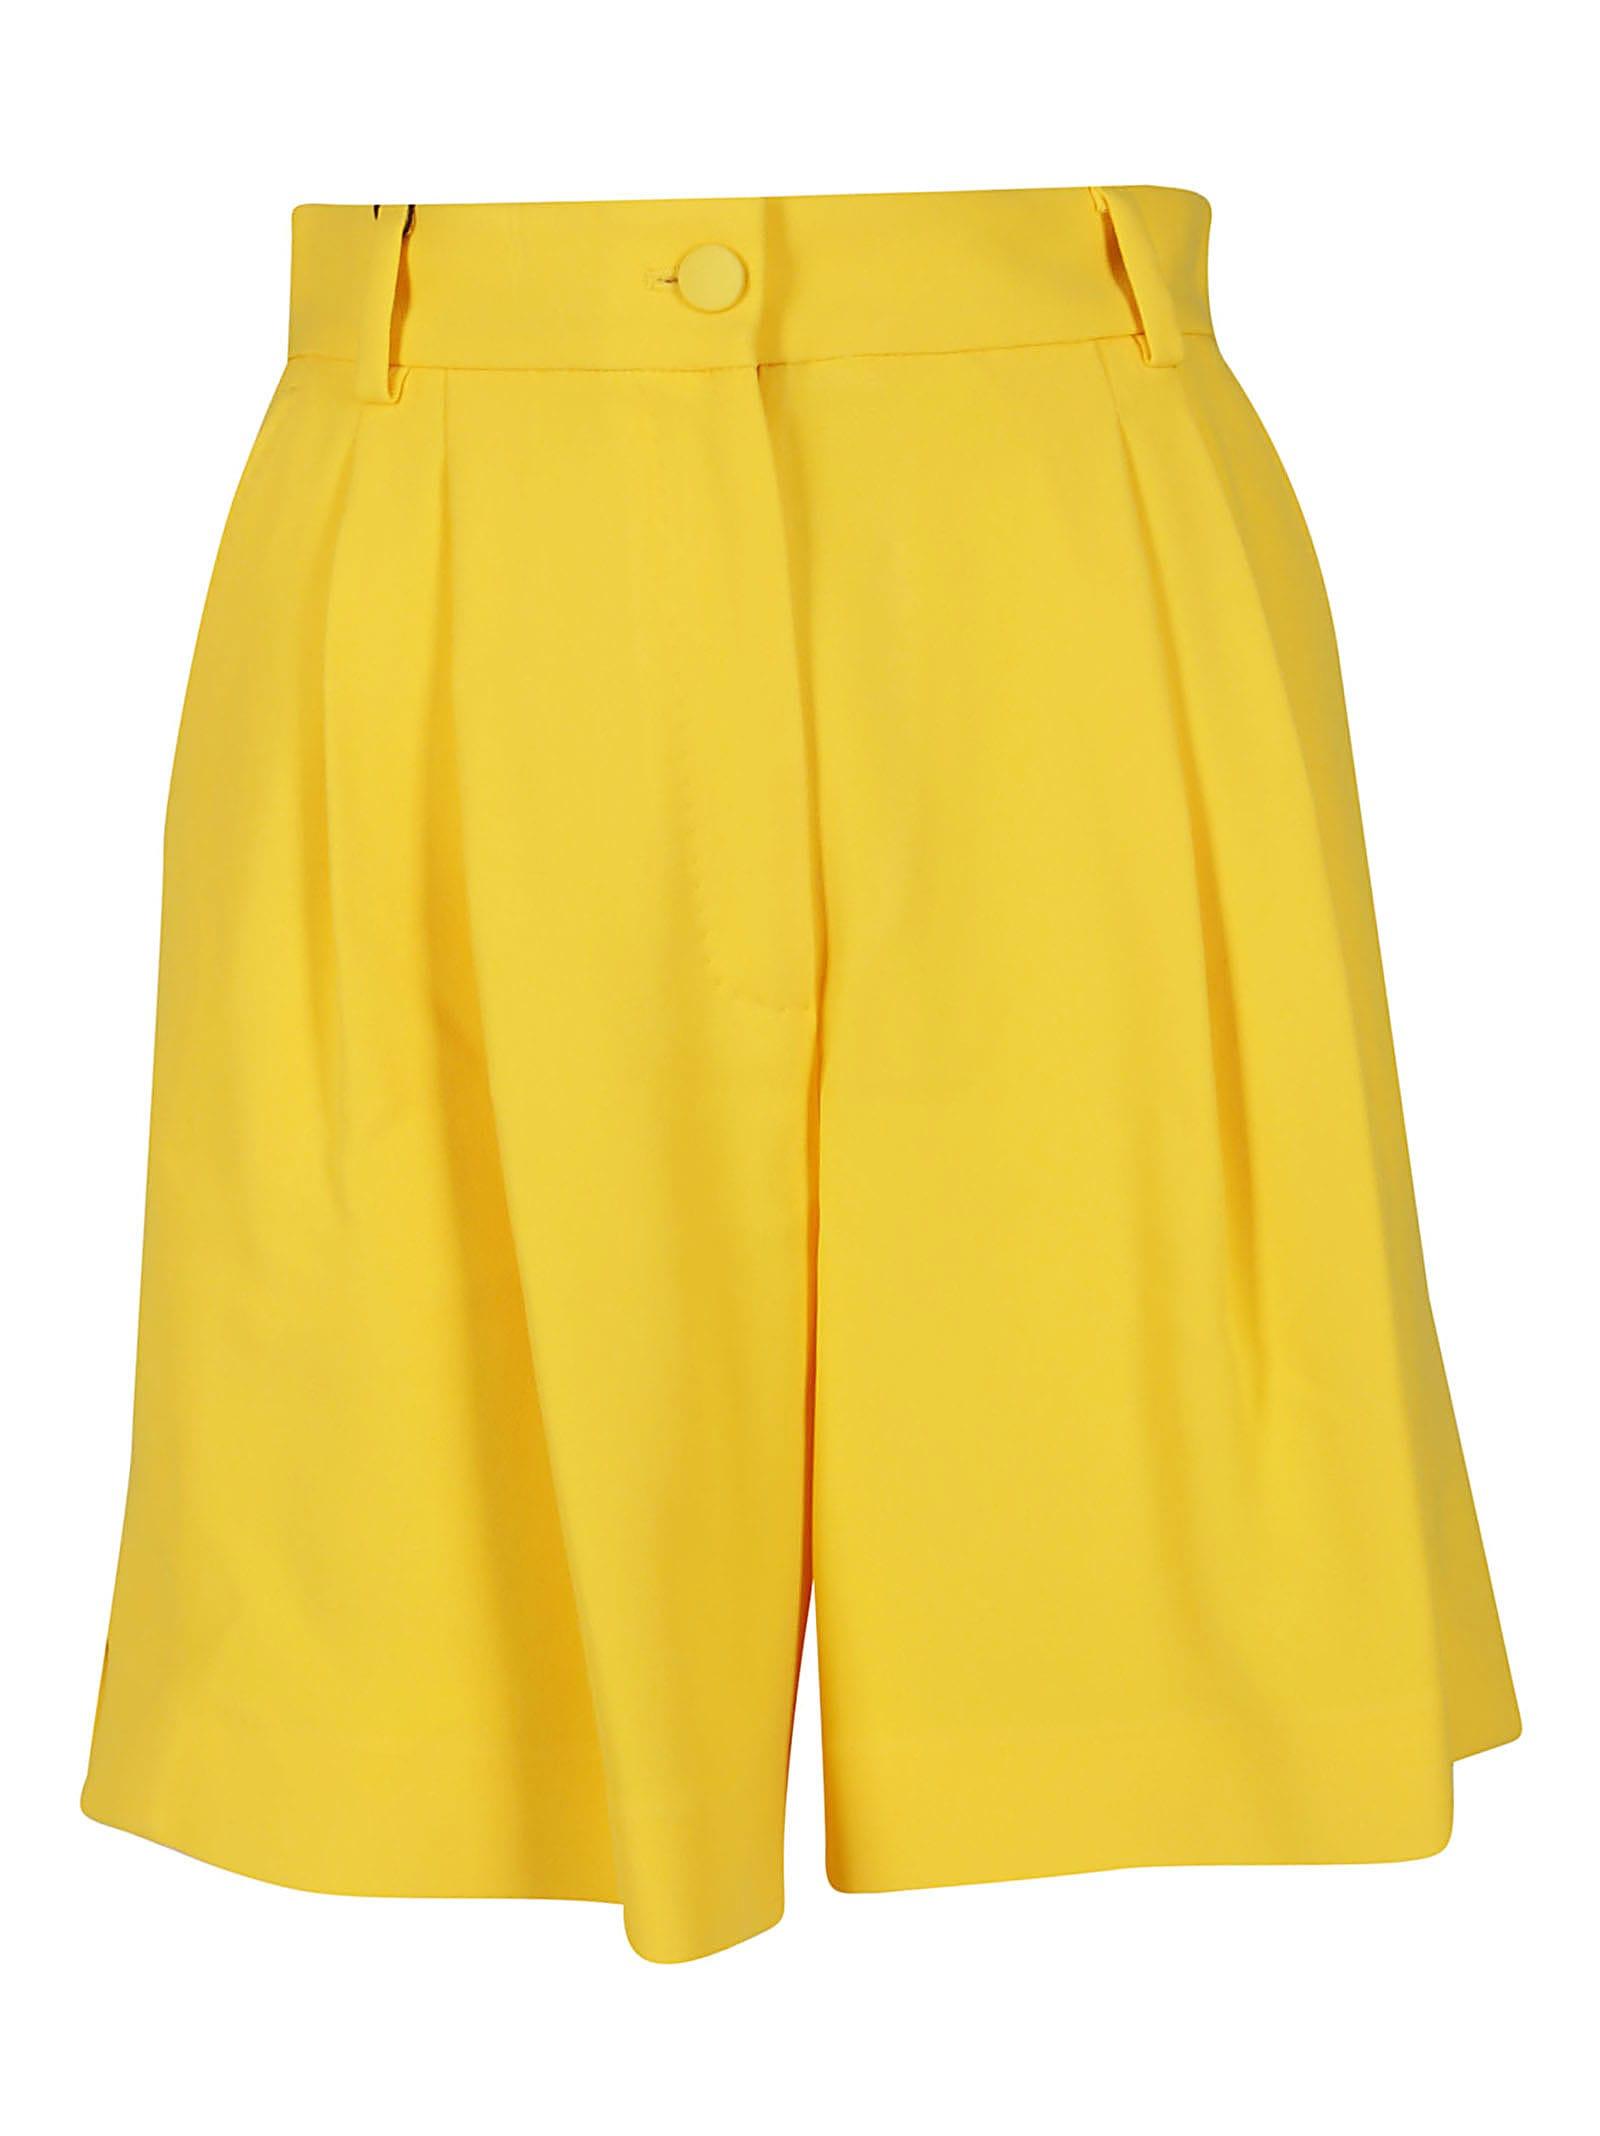 Dolce & Gabbana Shorts YELLOW VISCOSE BLEND SHORTS